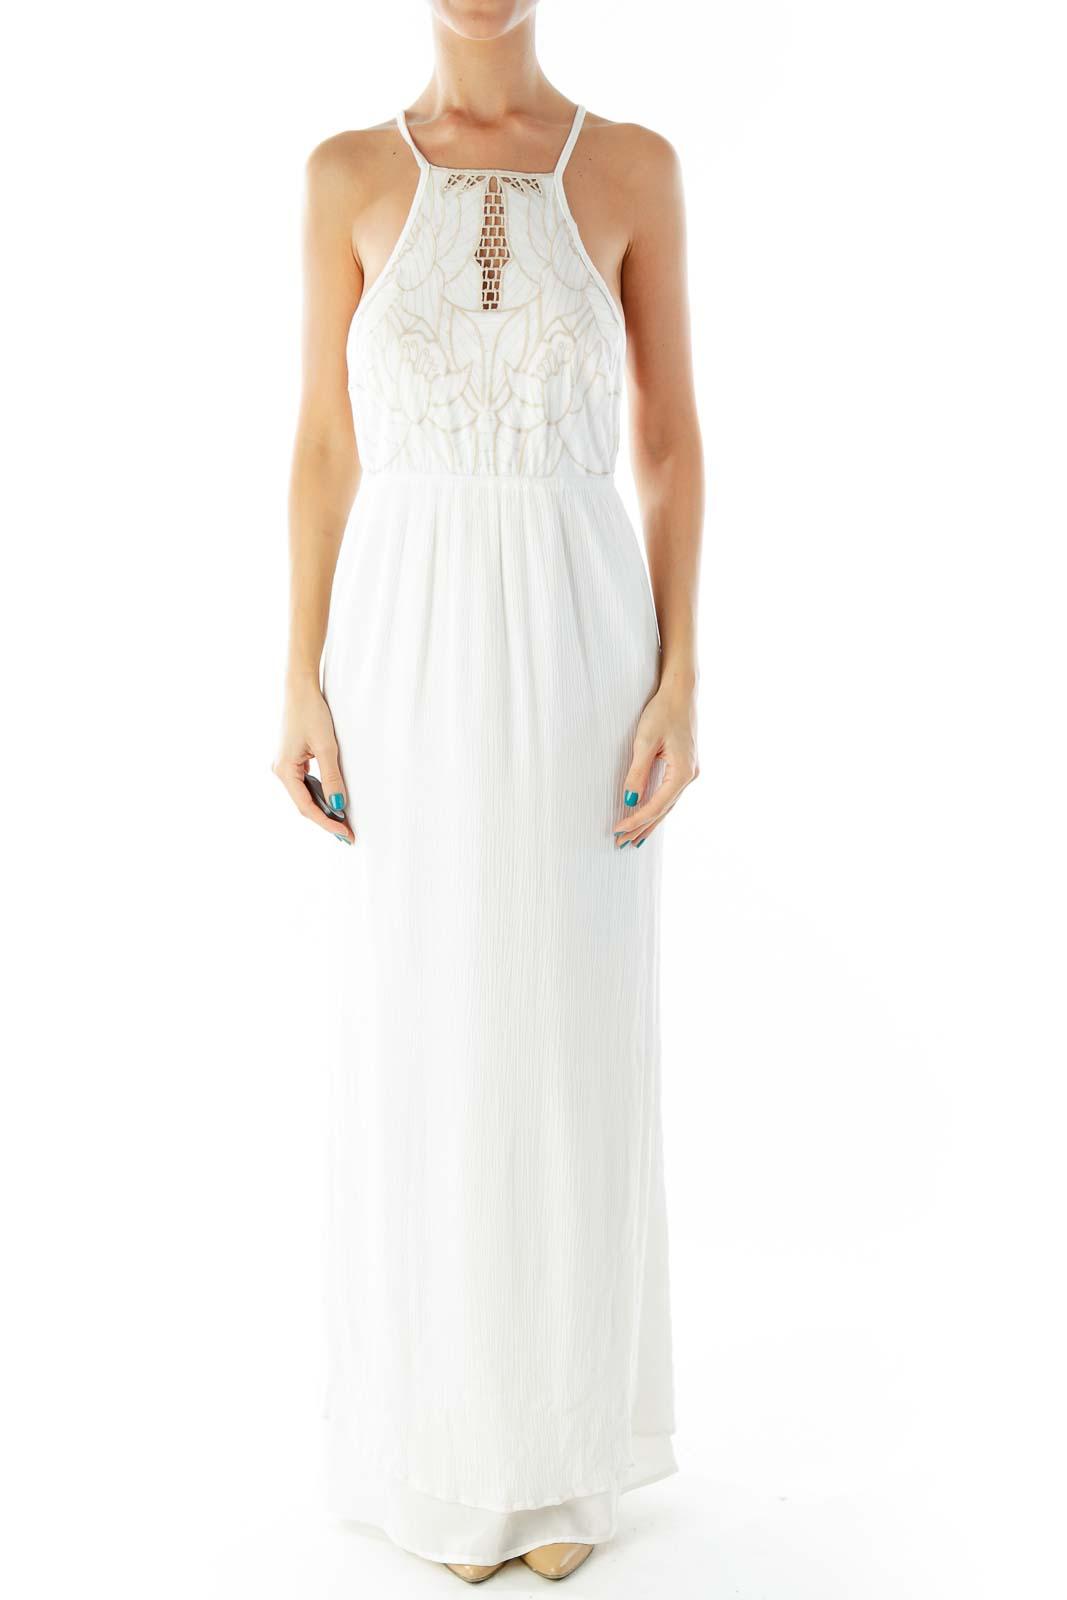 White Beige Embroidered Spaghetti Strap Maxi Dress